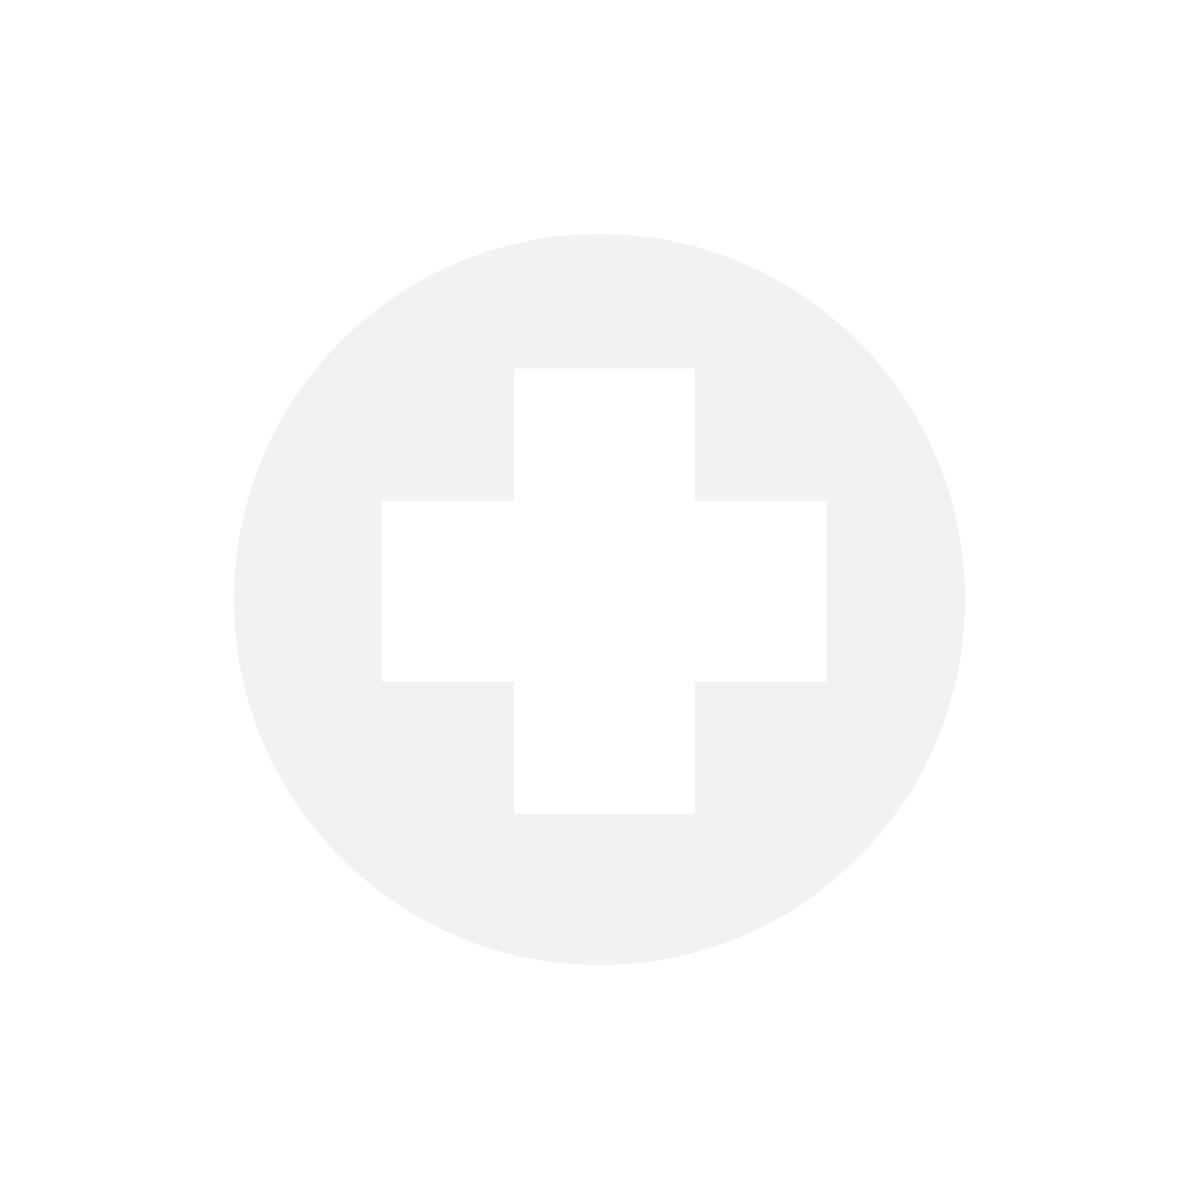 CEFAR Câble bipolaire pour Cefar Easy